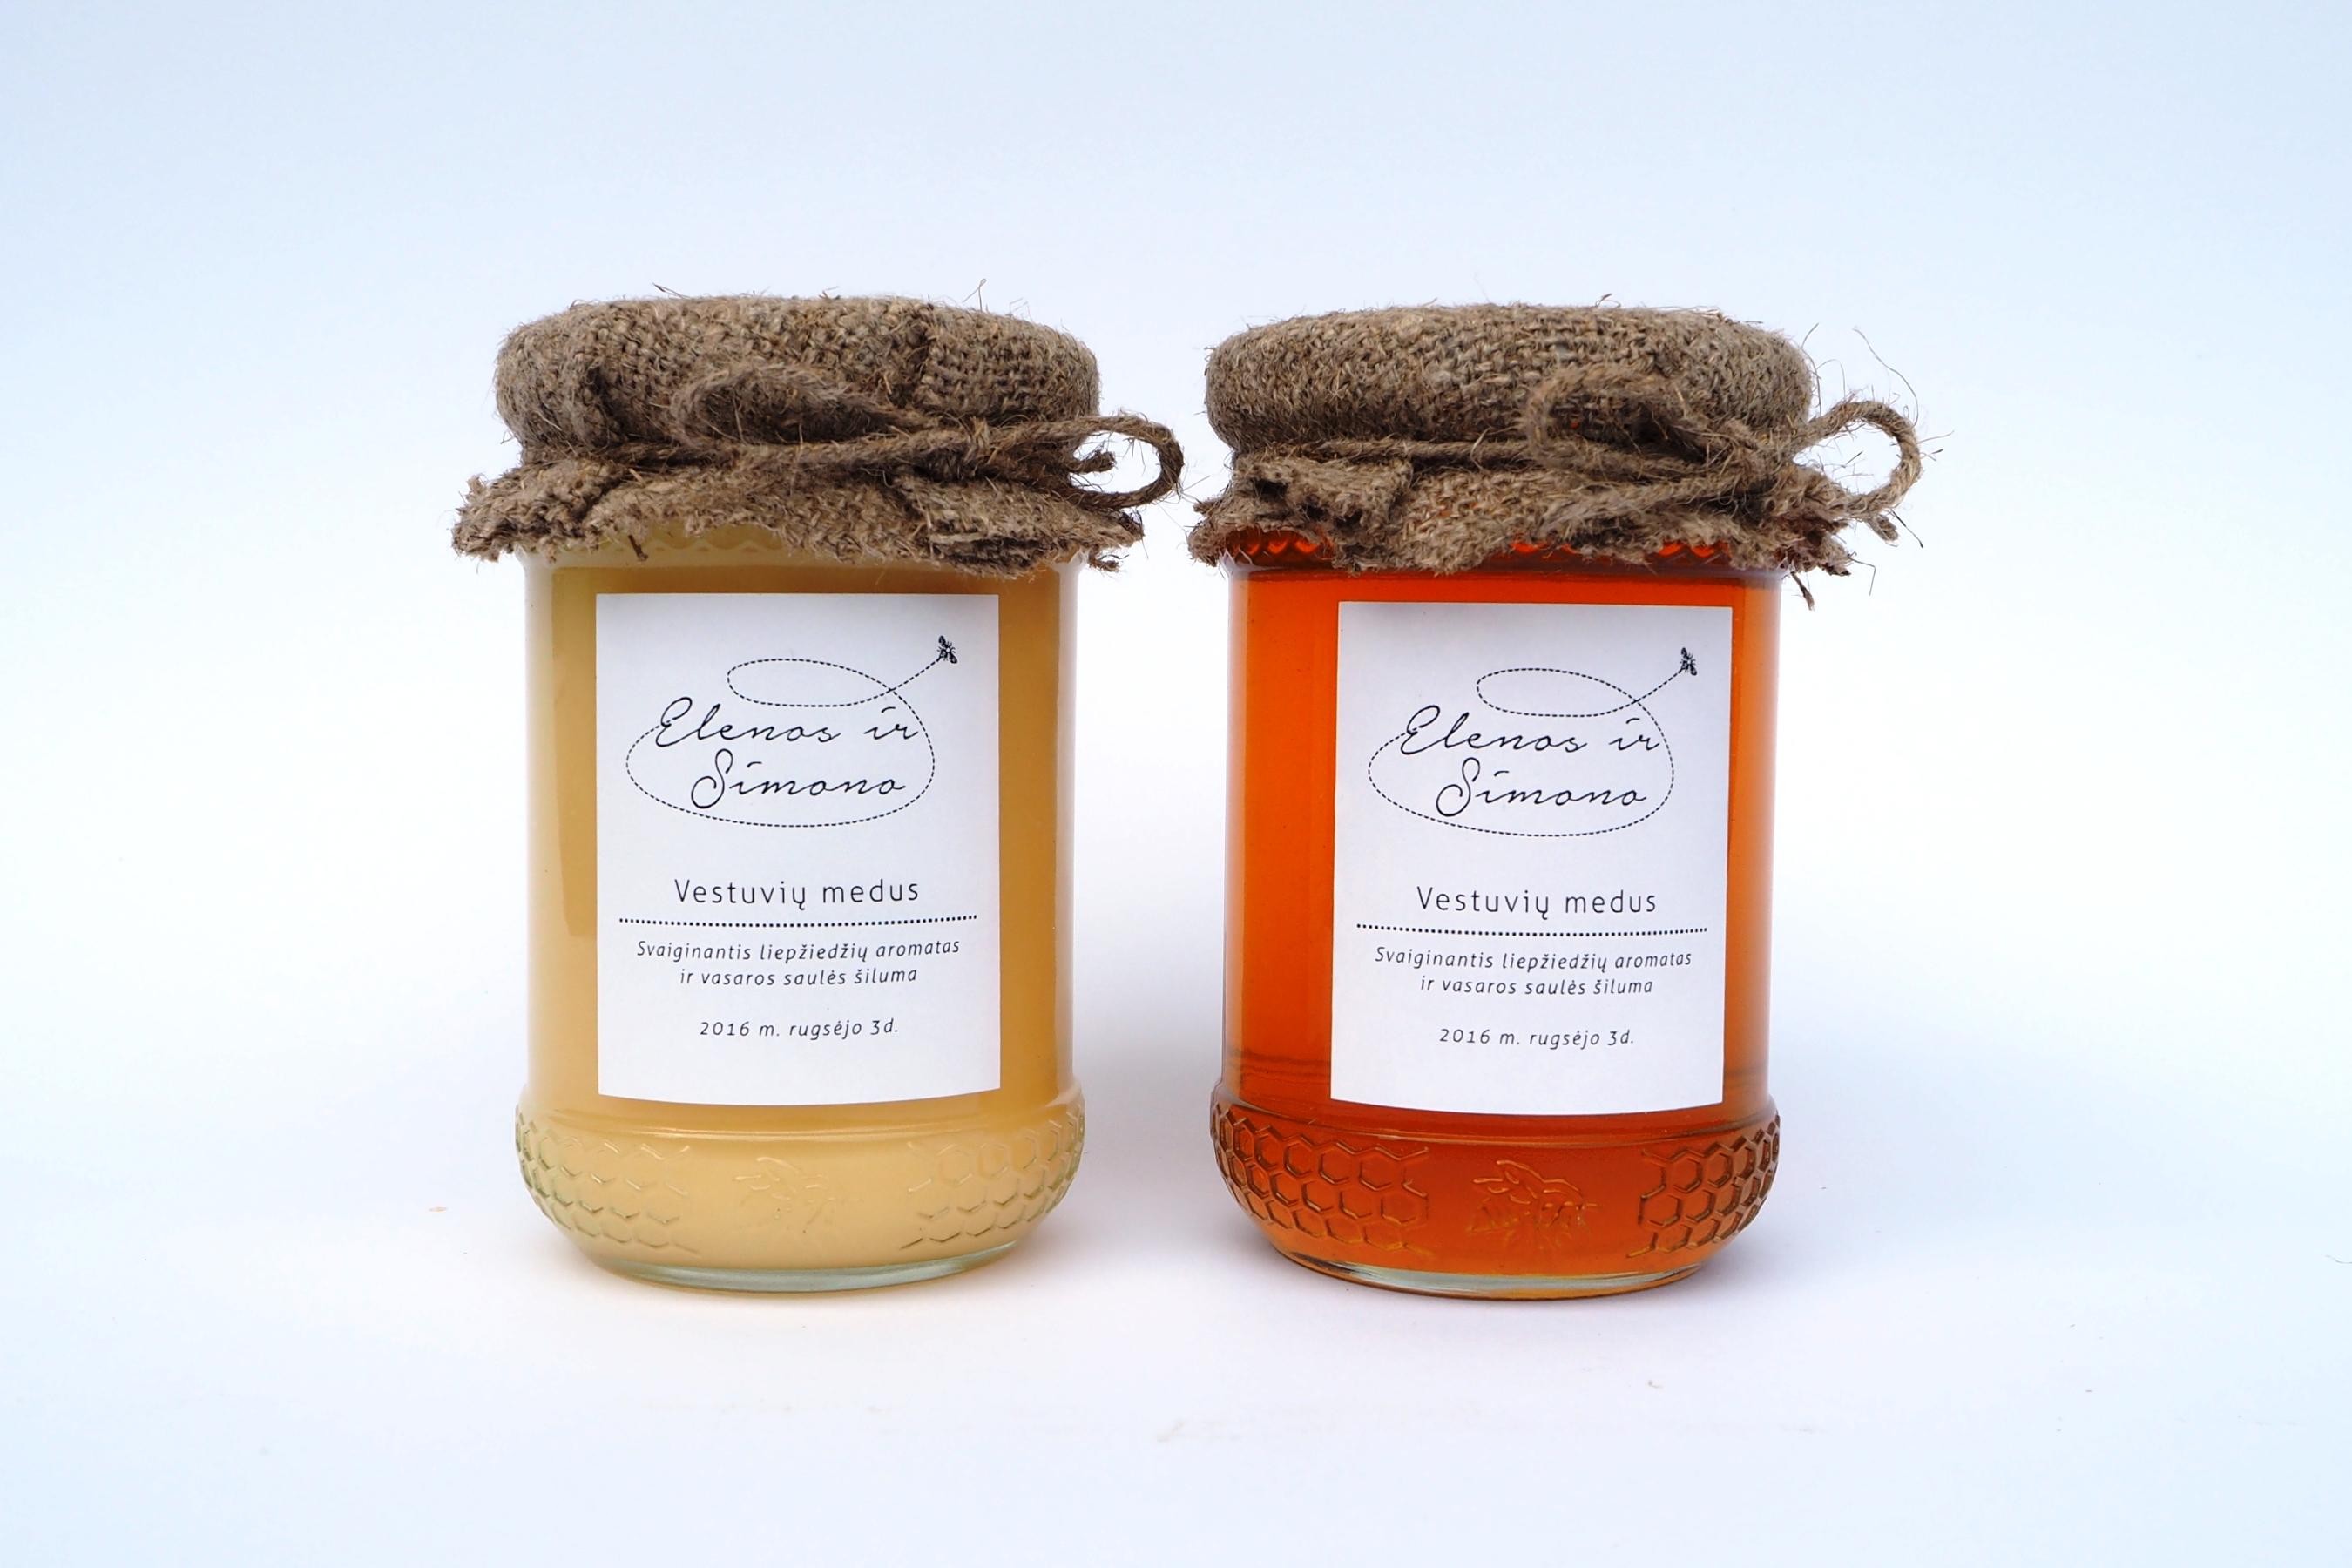 Vestuvių medus - 400 g.